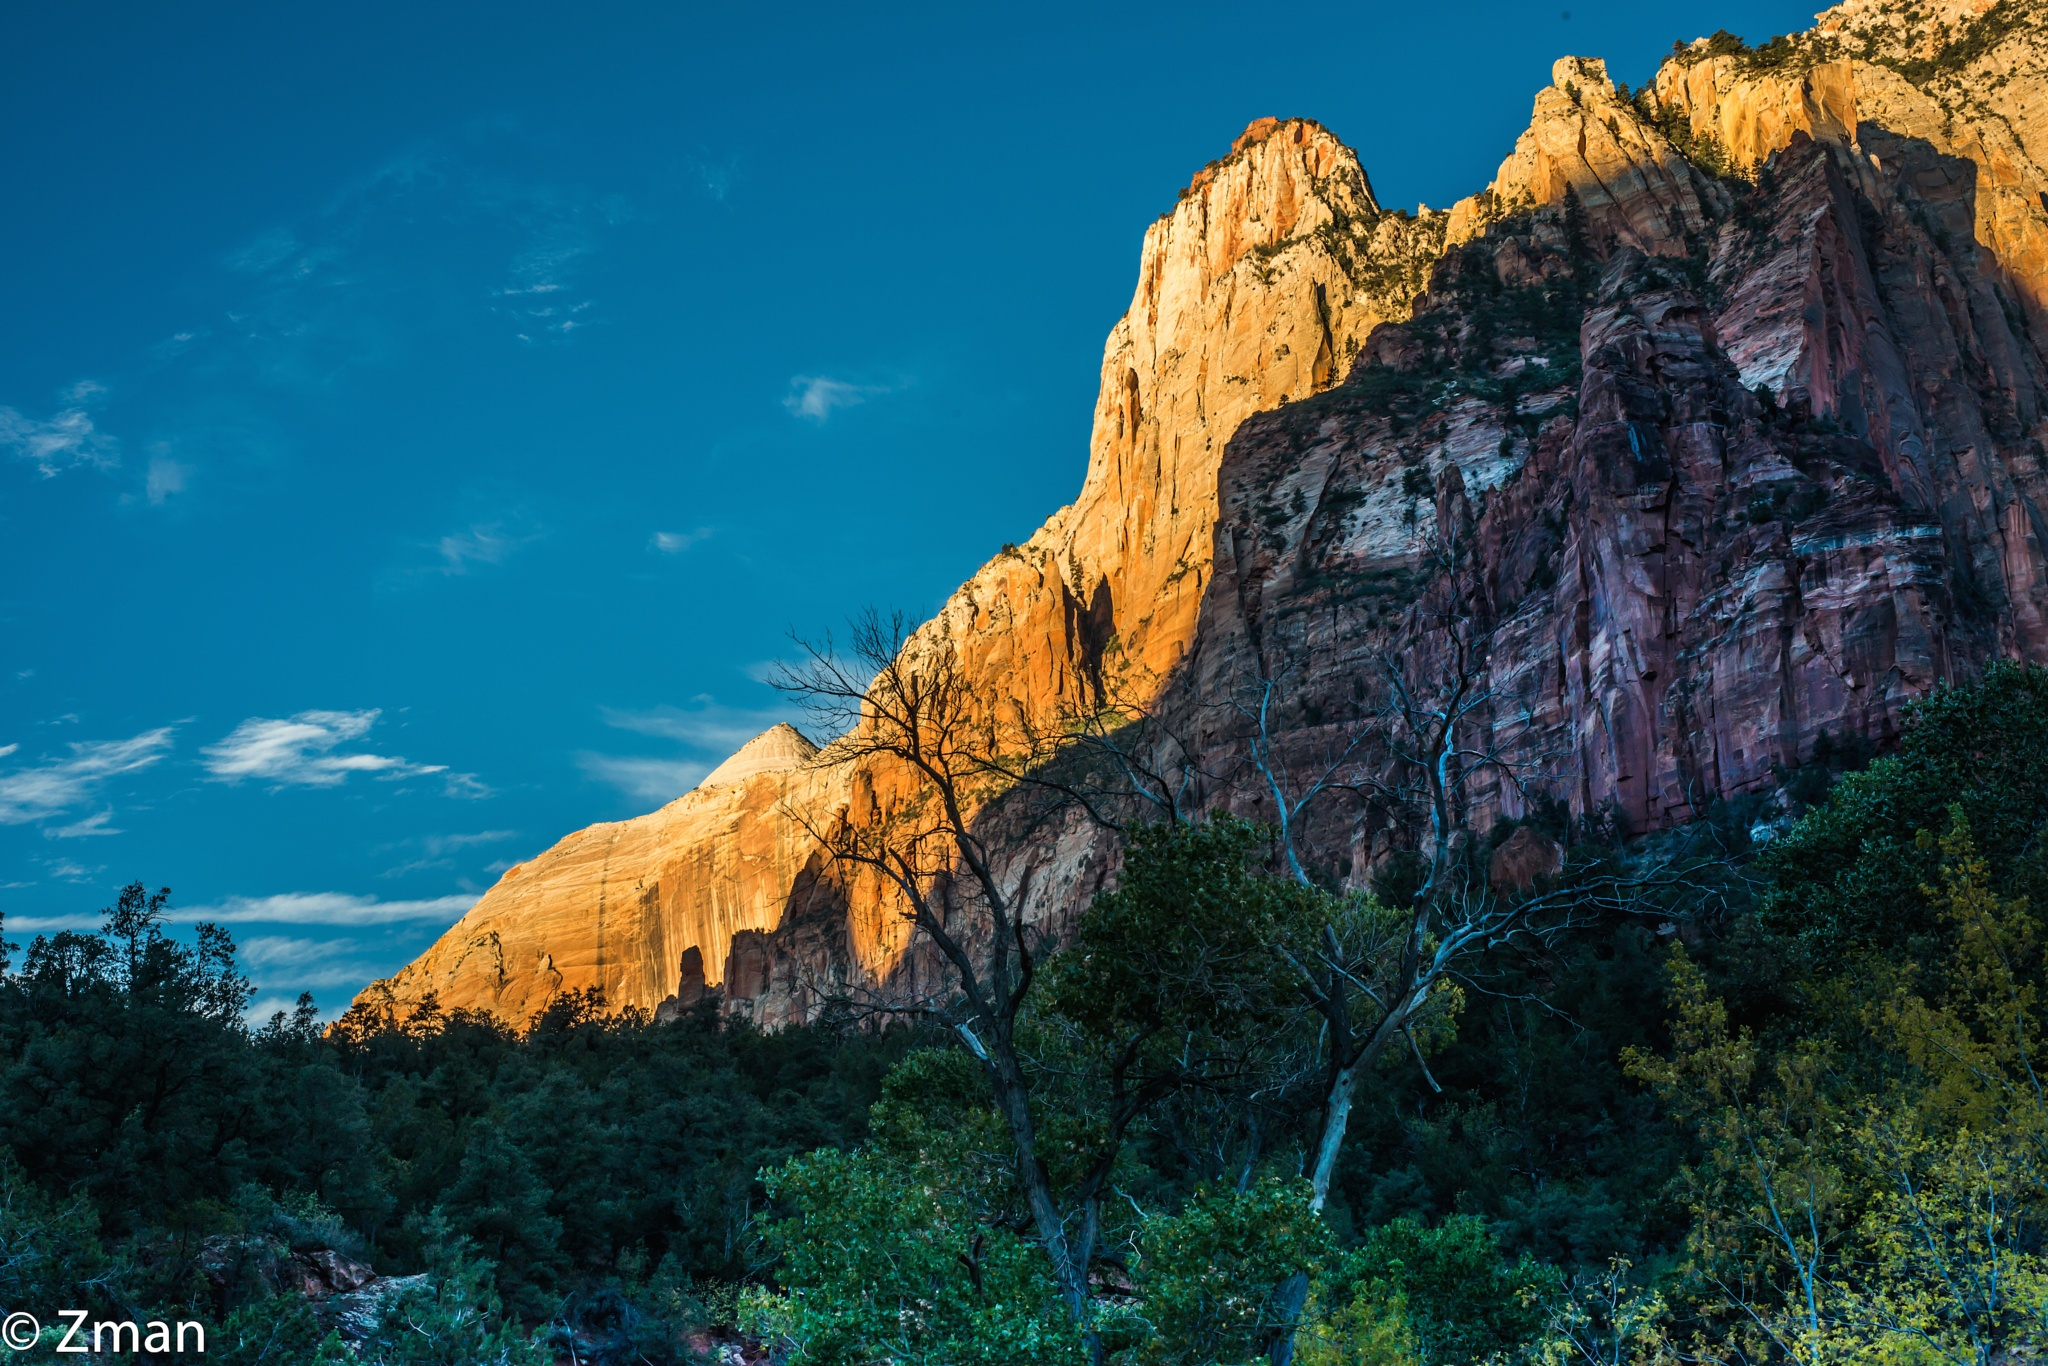 Sunrise at Zion National Park by muhammad.nasser.963